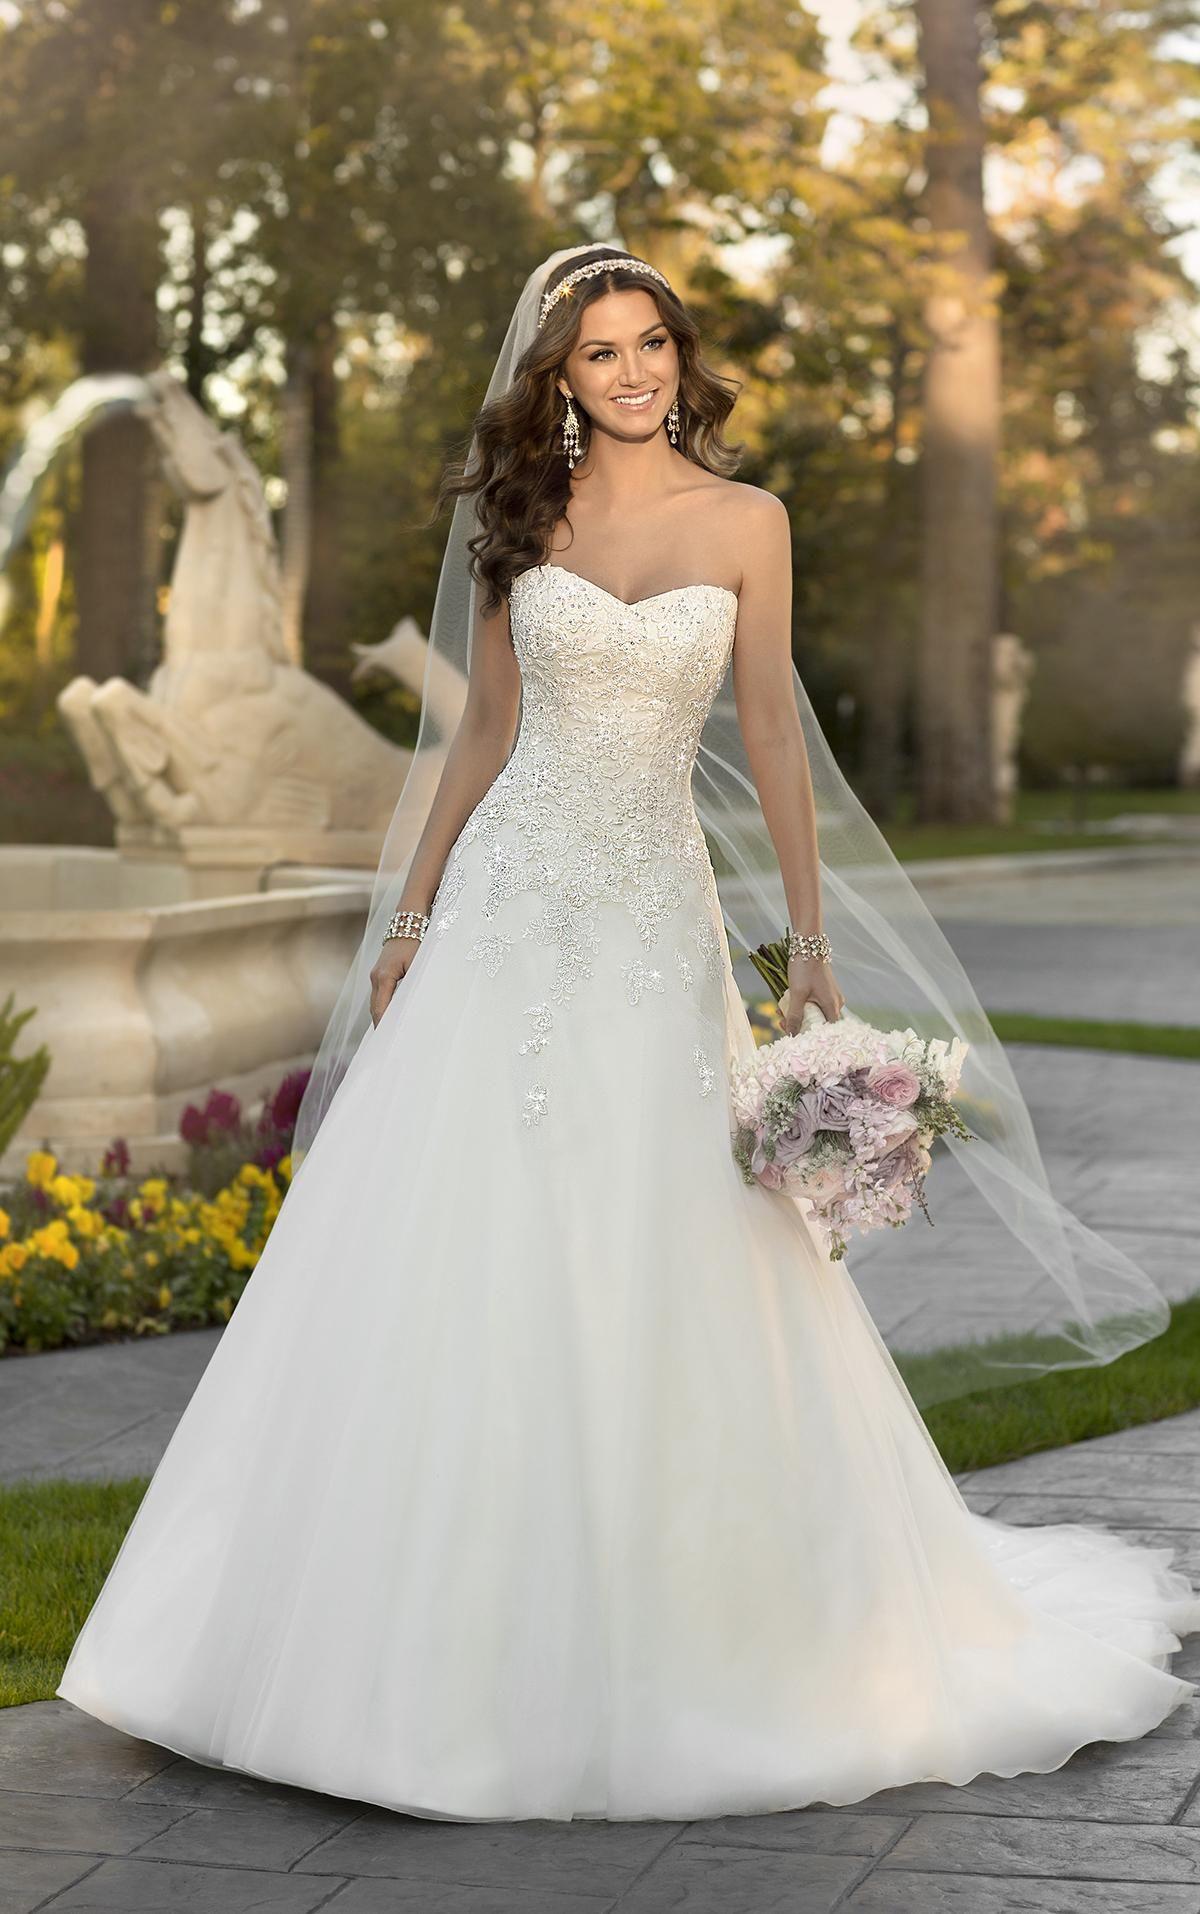 Wedding Dress Cheap 2016 A Line Wedding Dresses With Free Veil ...